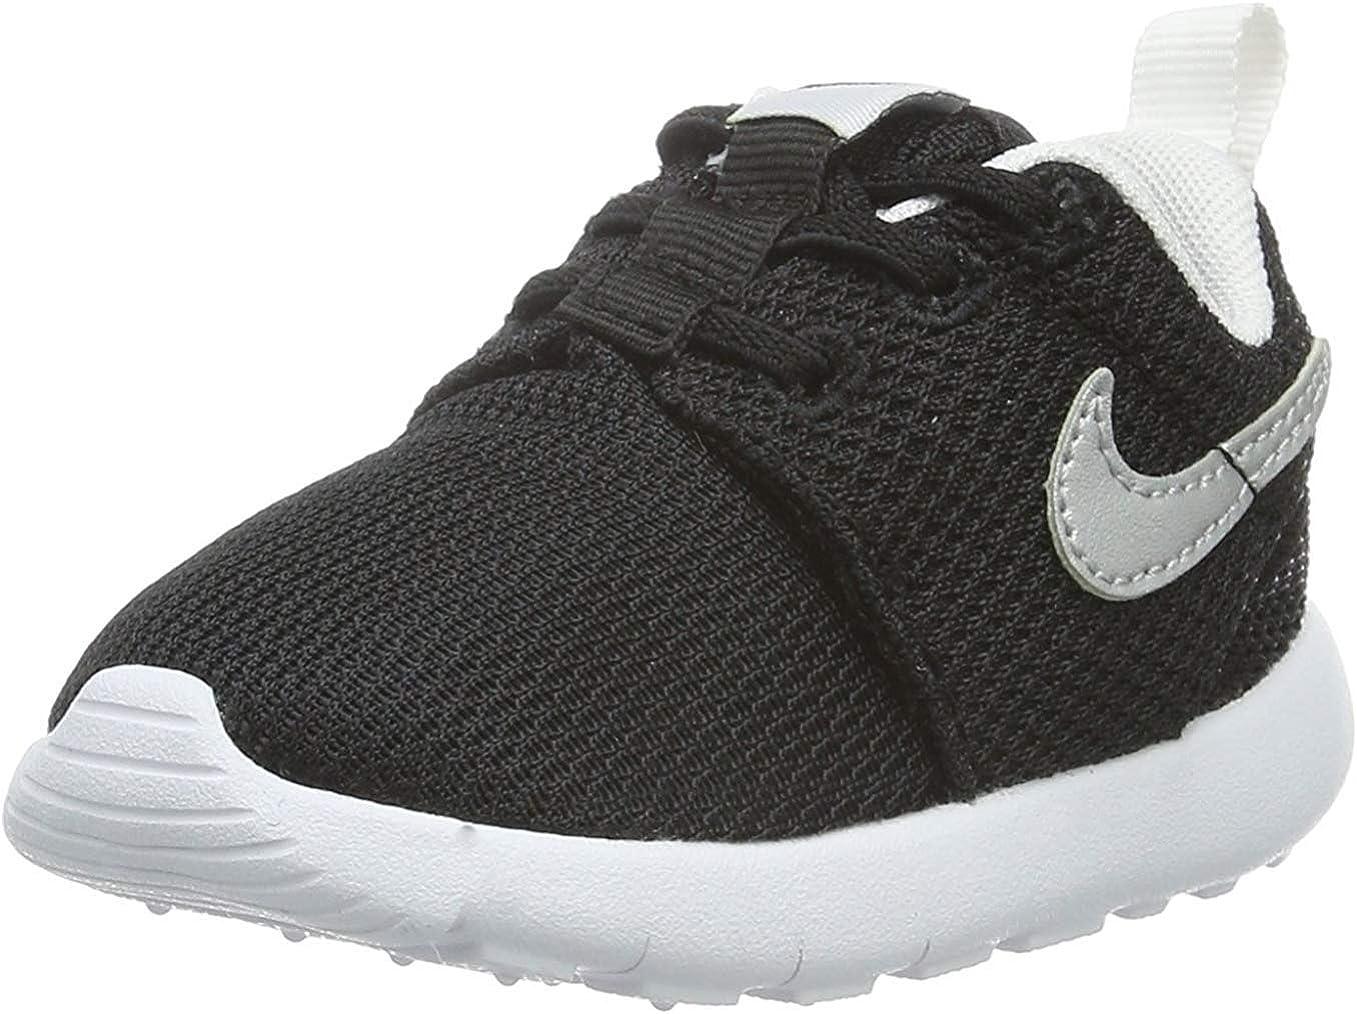 Amazon.com: Nike Roshe One (TDV) Infant